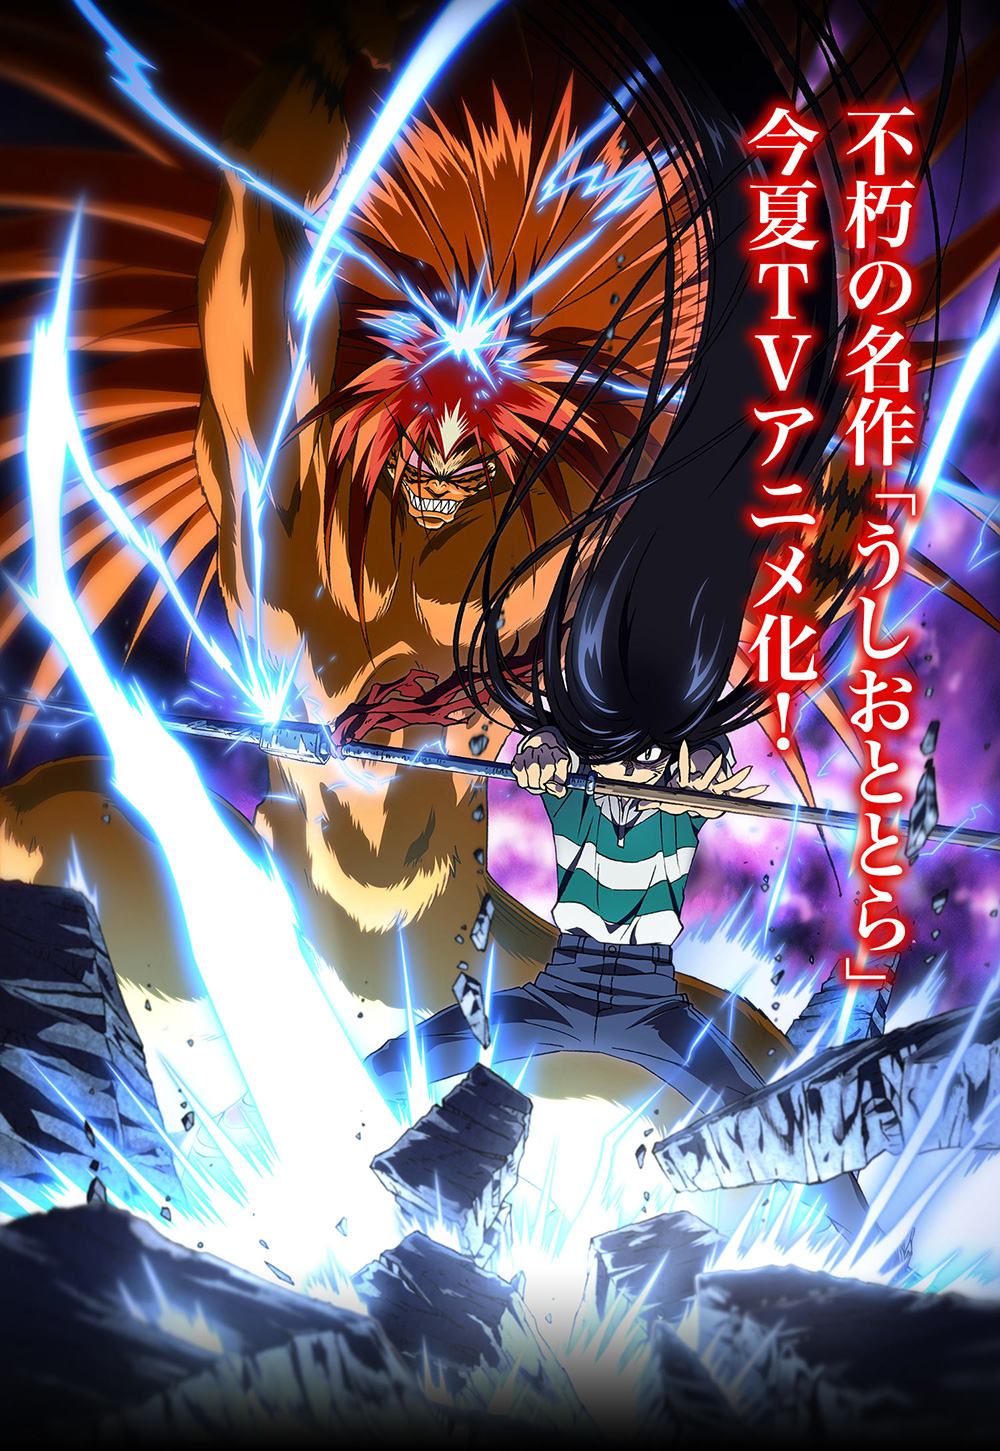 Ushio-to-Tora-Anime-Visual-2